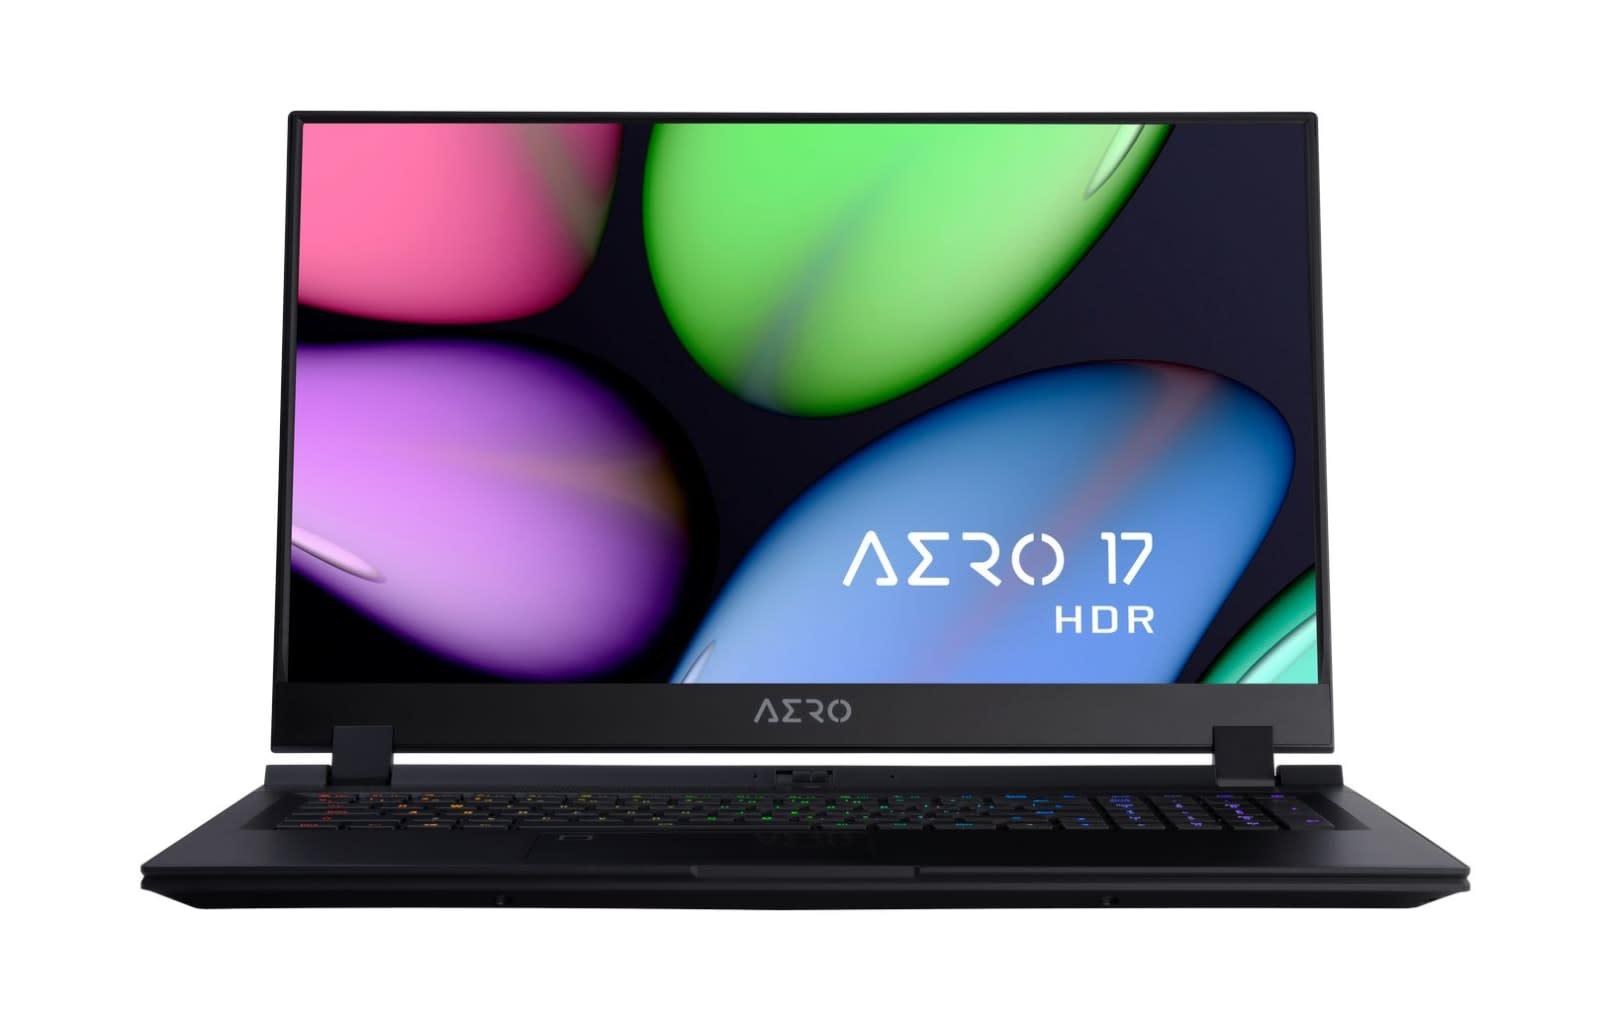 Gigabyte's Aero 17 has a 4K HDR display and Intel's 8-core i9 CPU